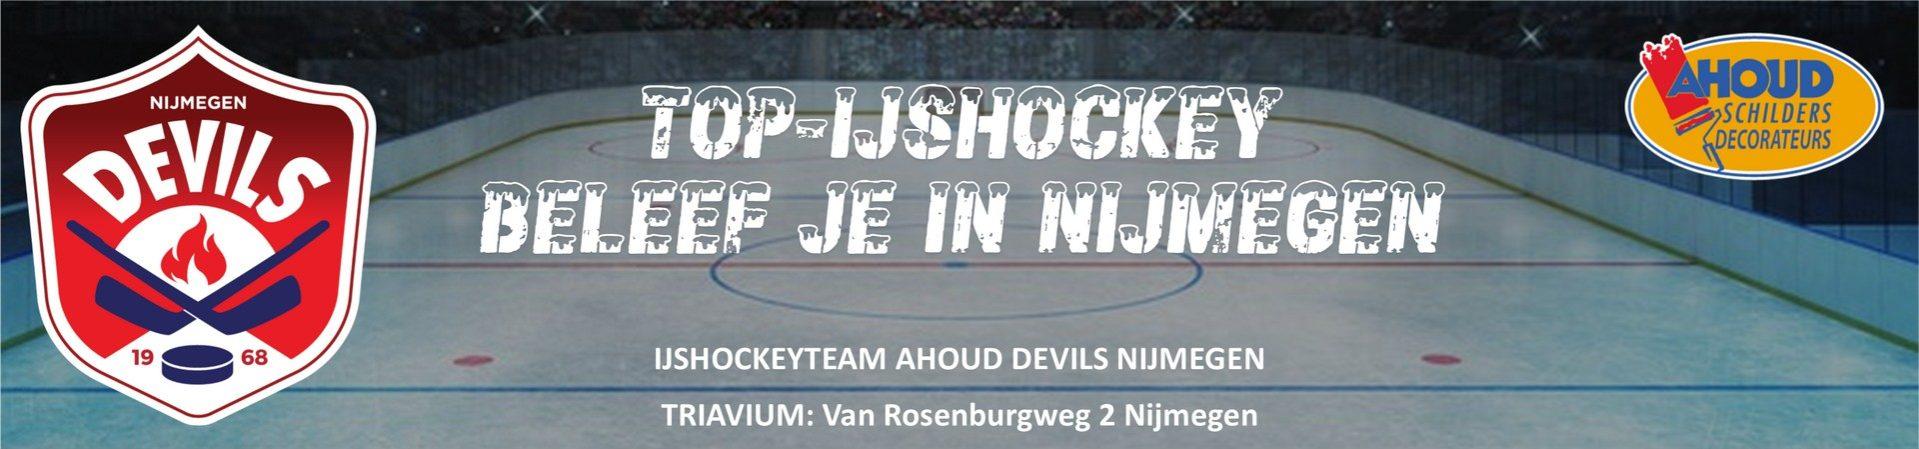 AHOUD Devils Nijmegen 1920x450